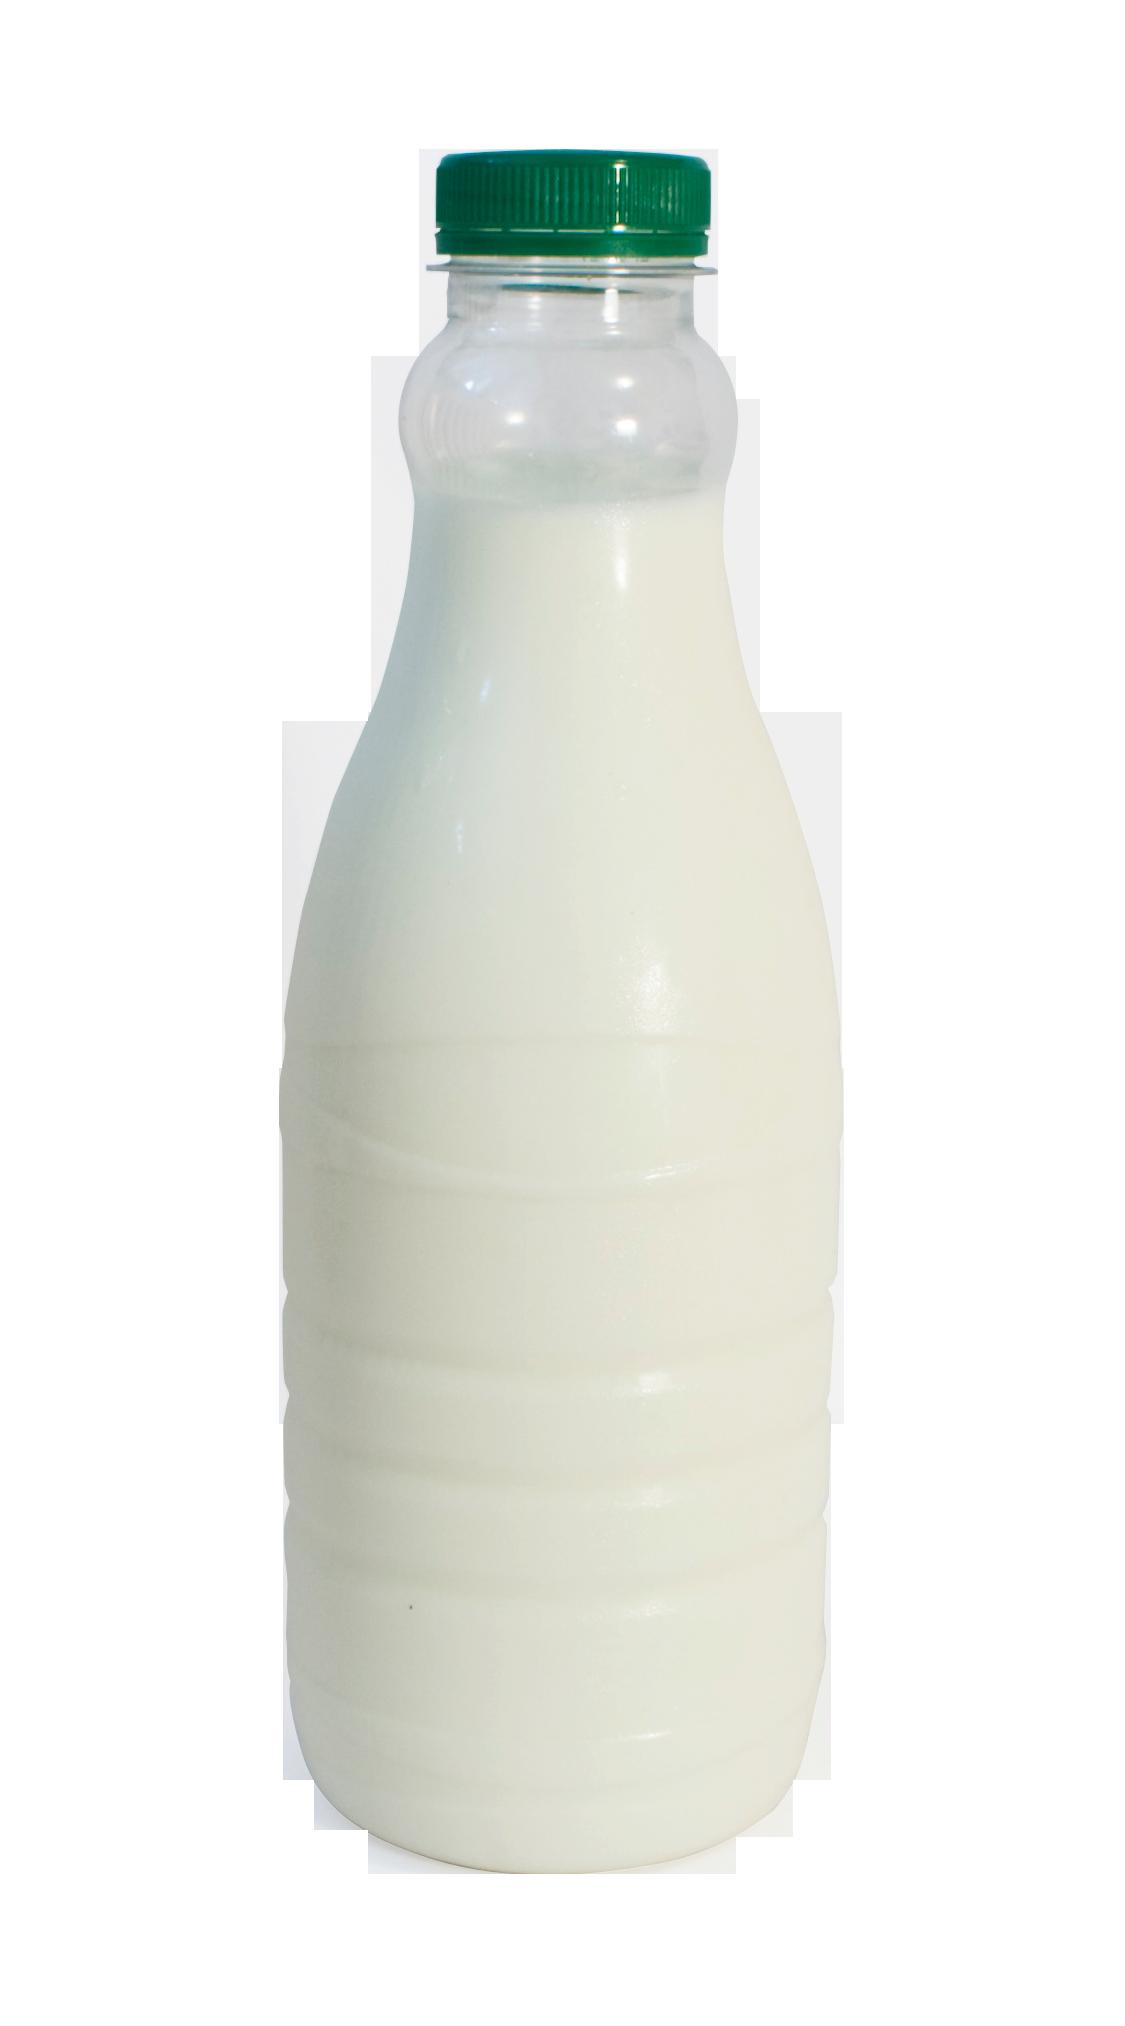 Milk Bottle Png Image Bottle Milk Bottle Milk